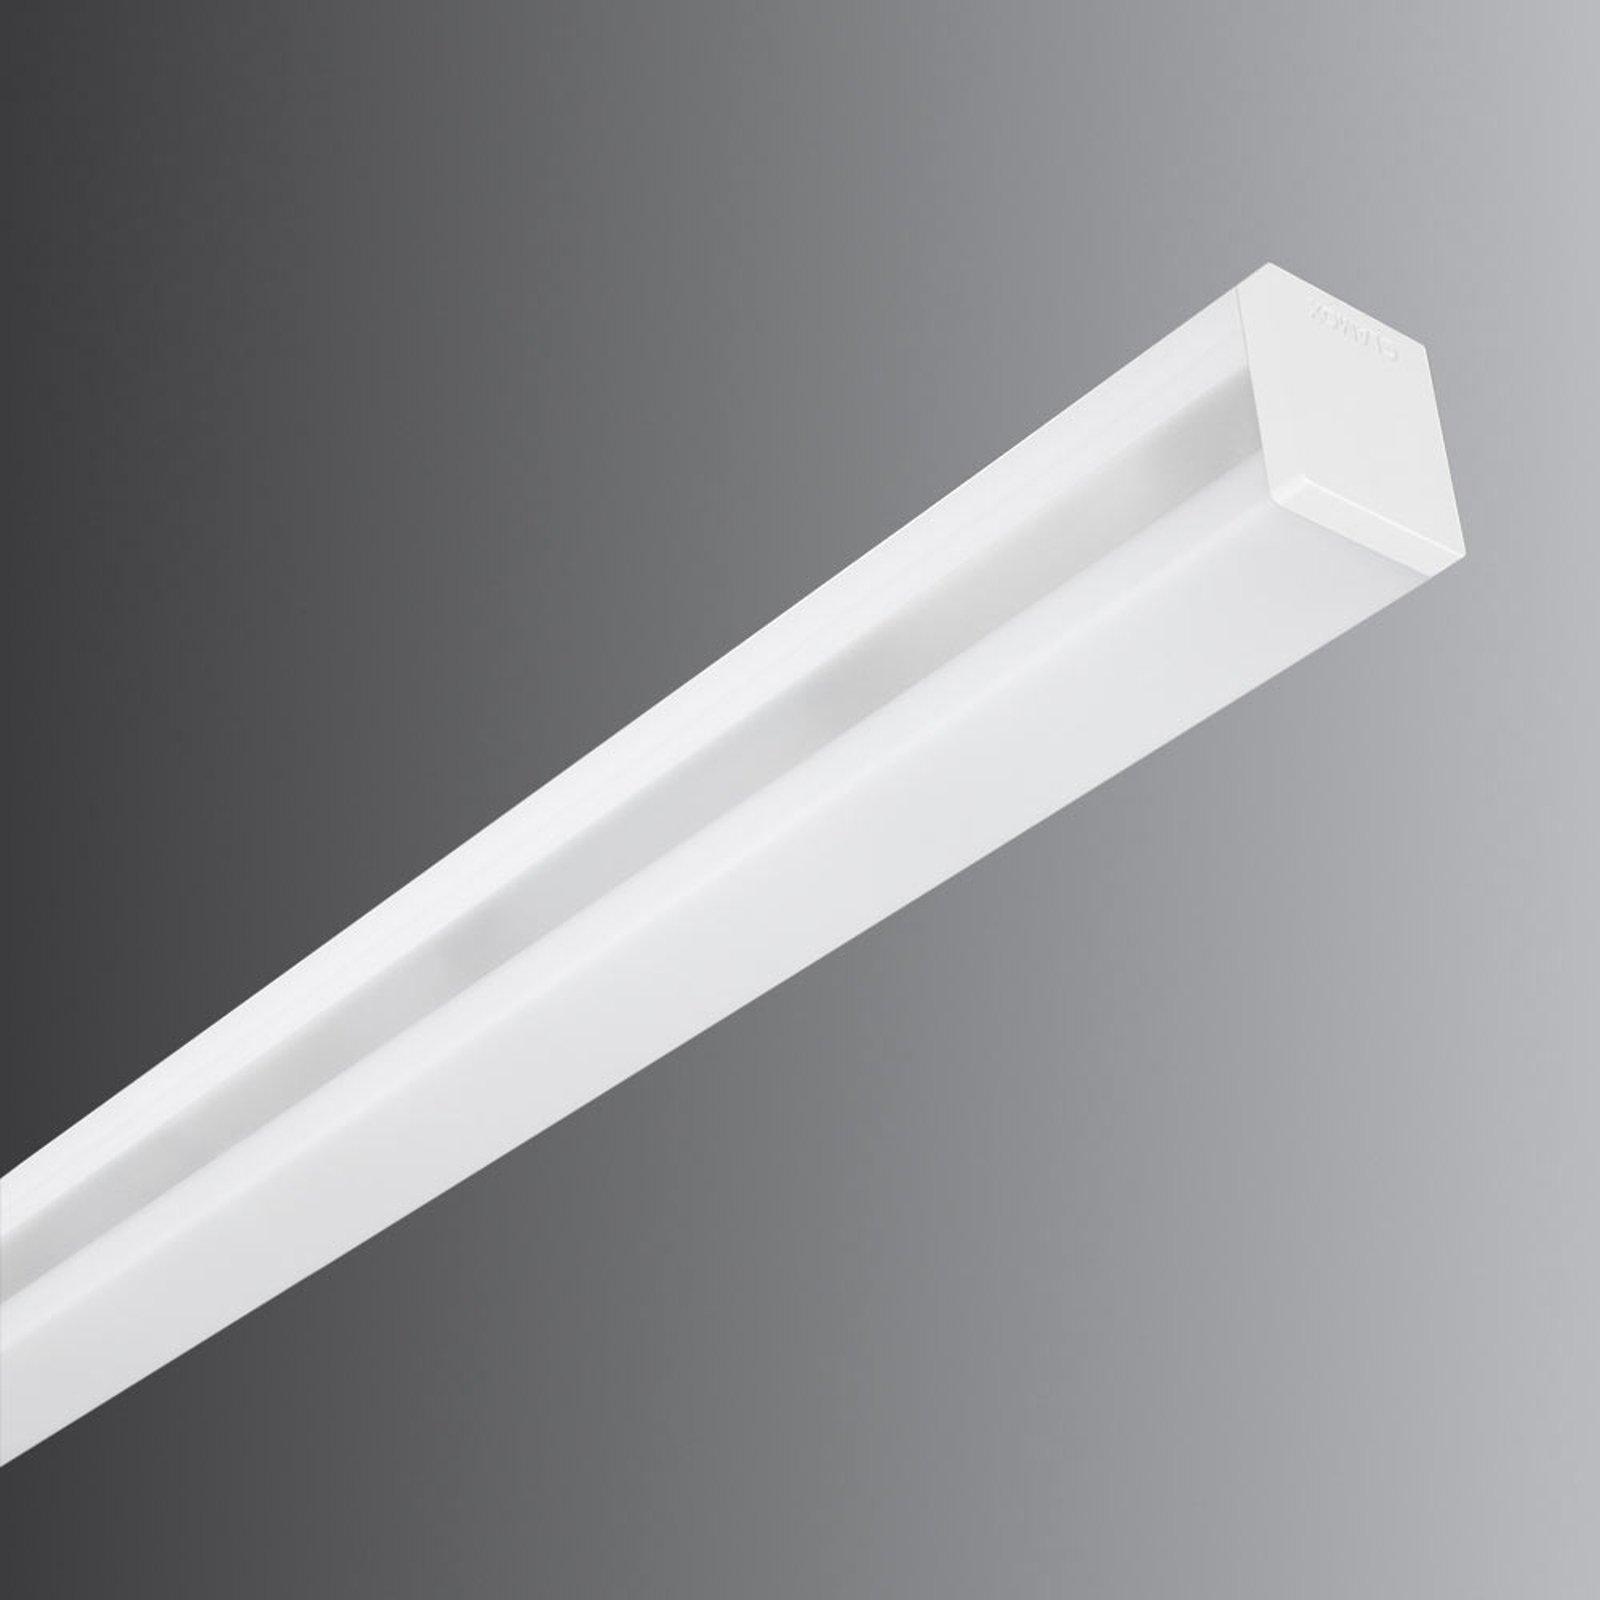 16 W LED speillampe A40-W1200 2100HF 120 cm 4 000